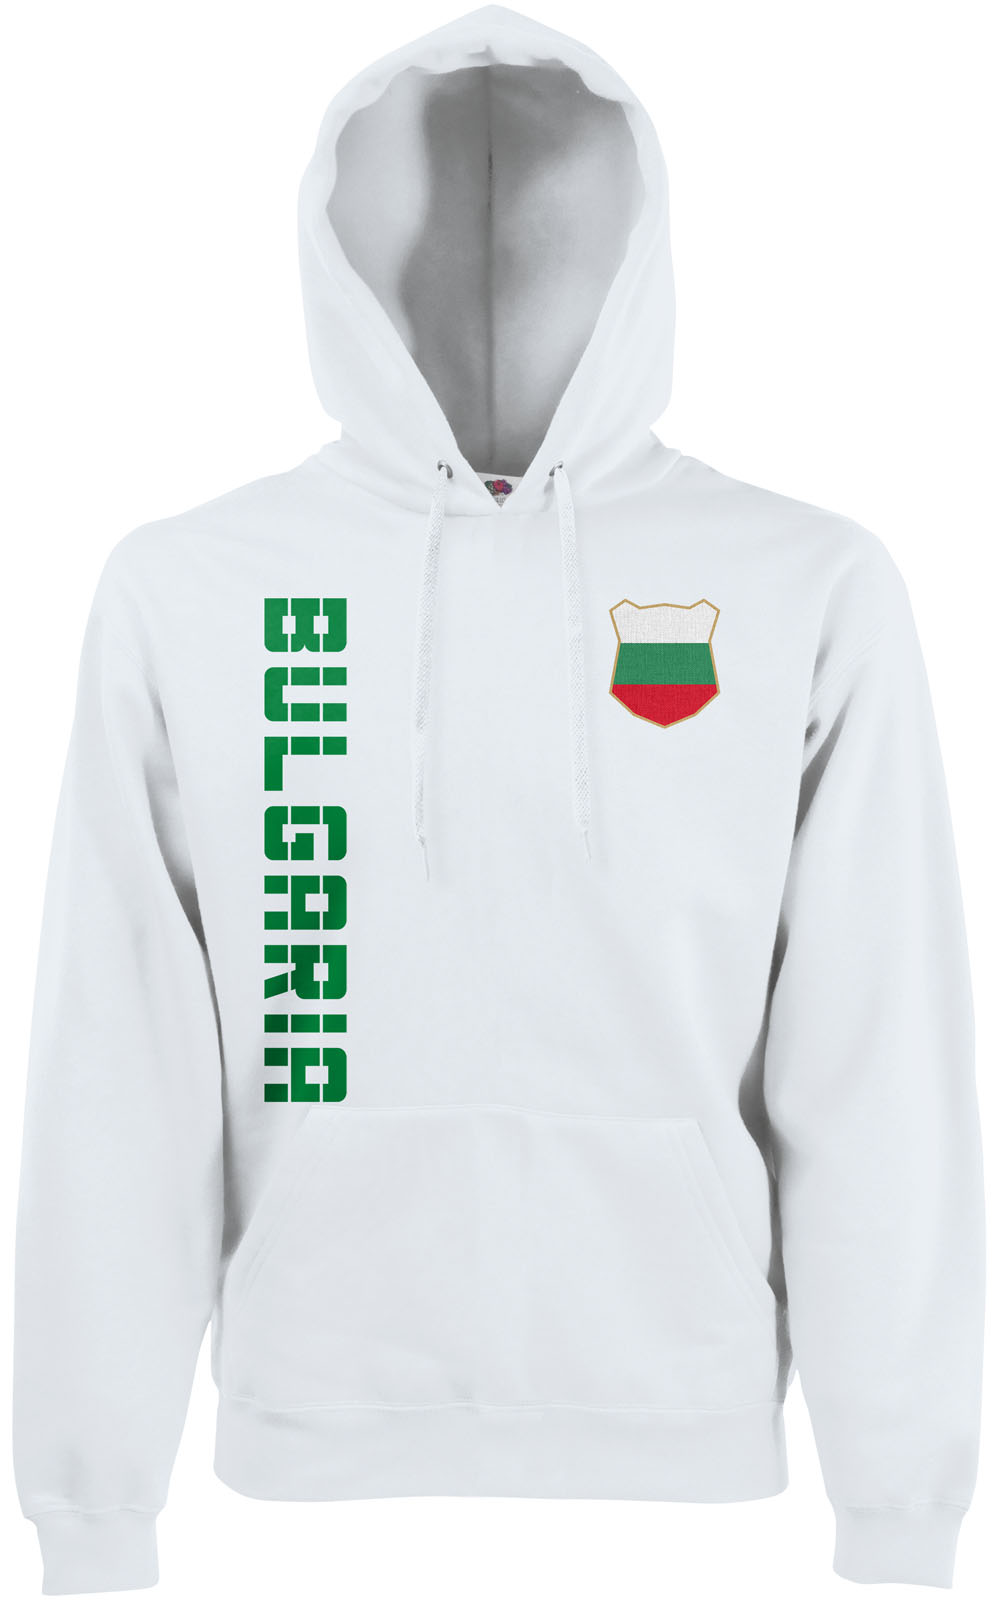 Bulgarien Bulgaria Hoody Kapuzen Pullover Trikot mit Name /& Nummer S M L XL XXL